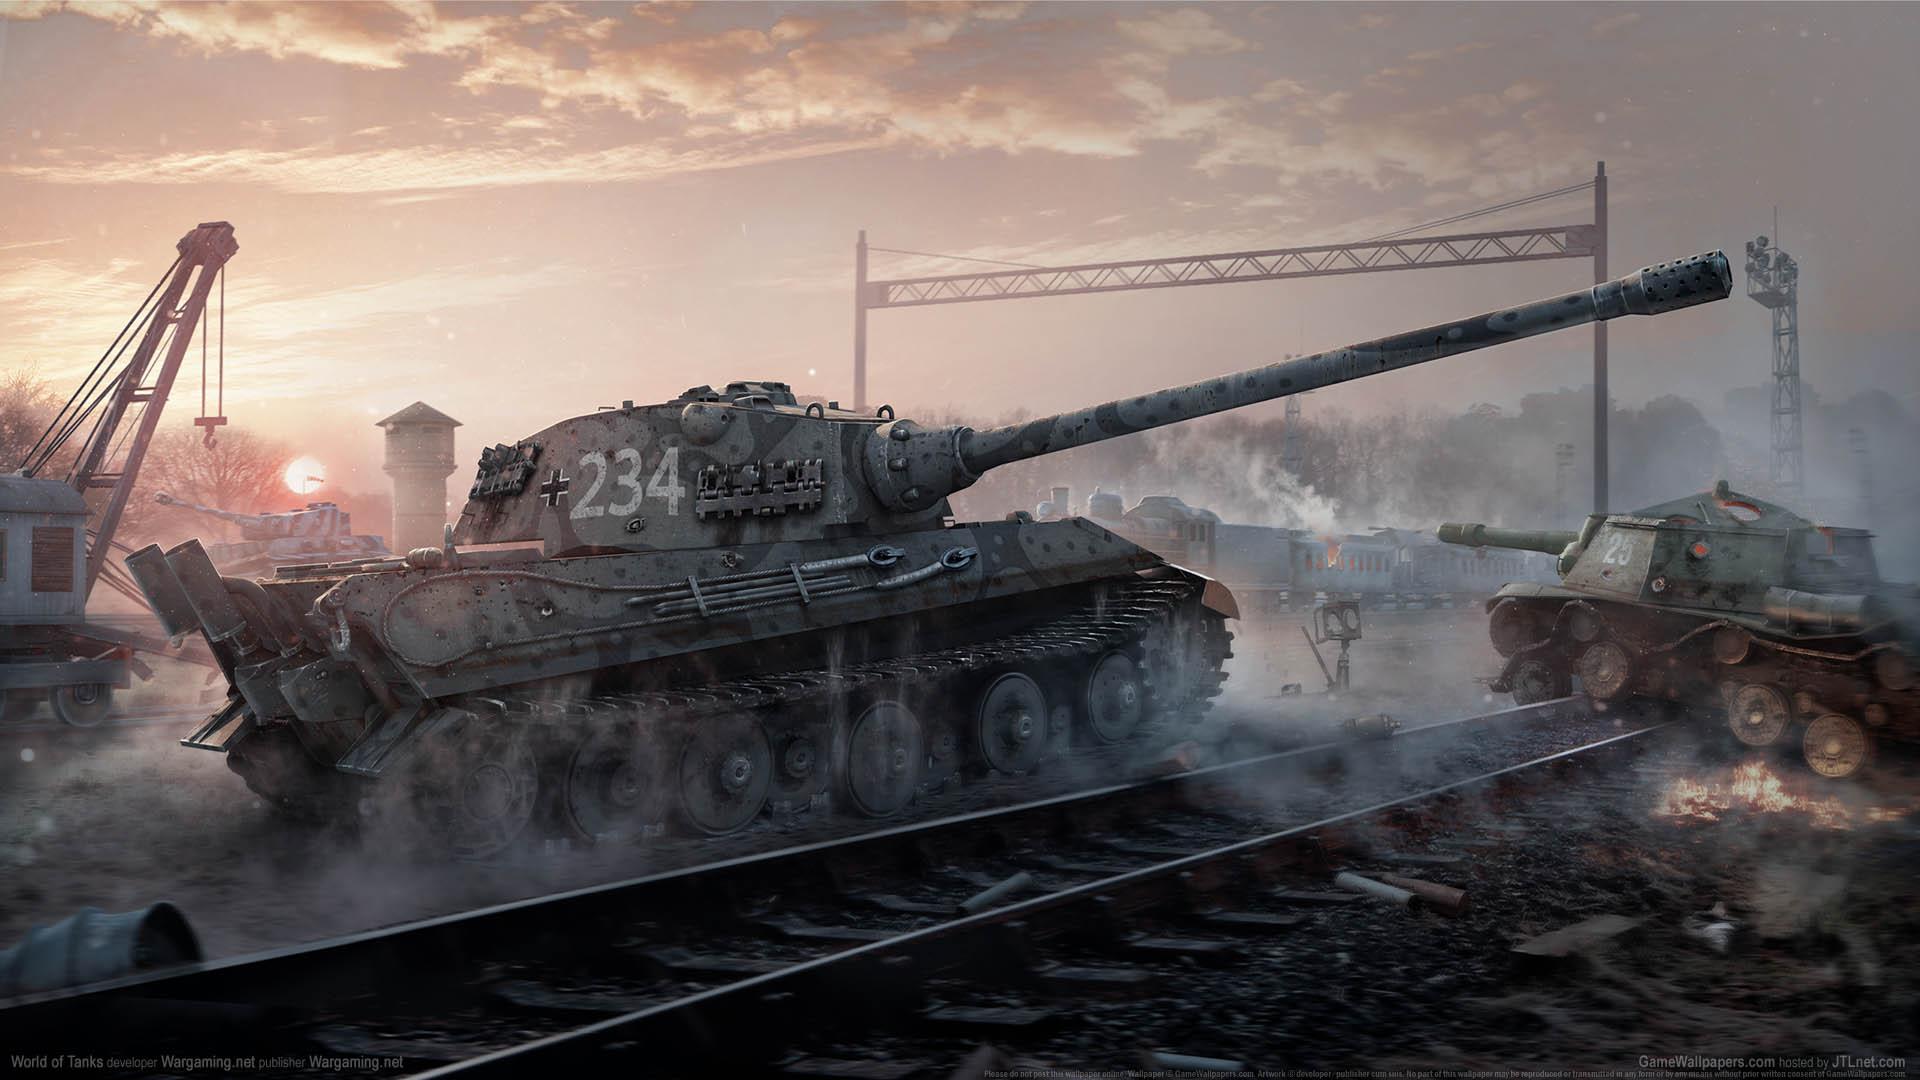 World of Tanks wallpaper 10 1920x1080